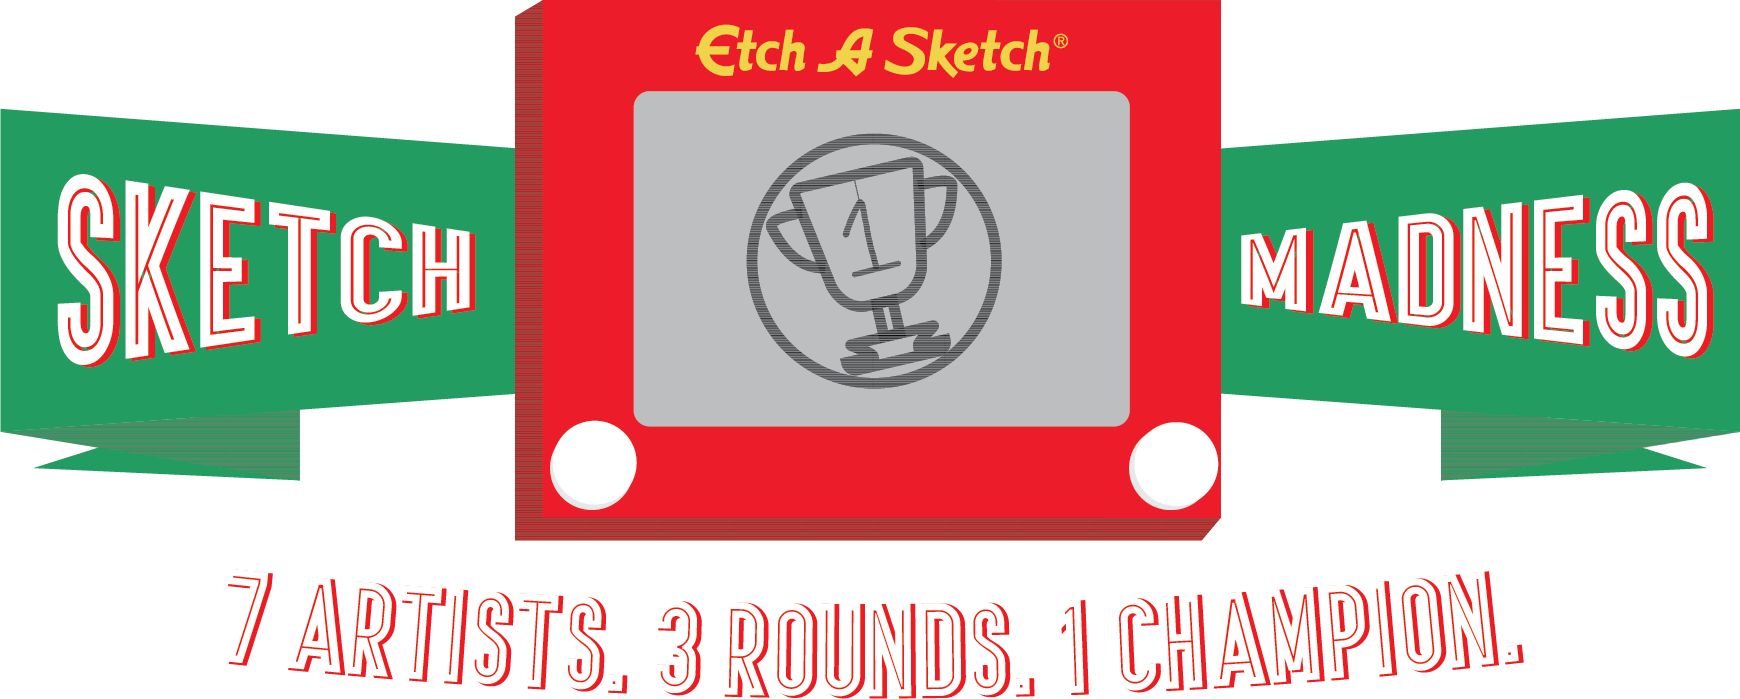 Sketch Madness